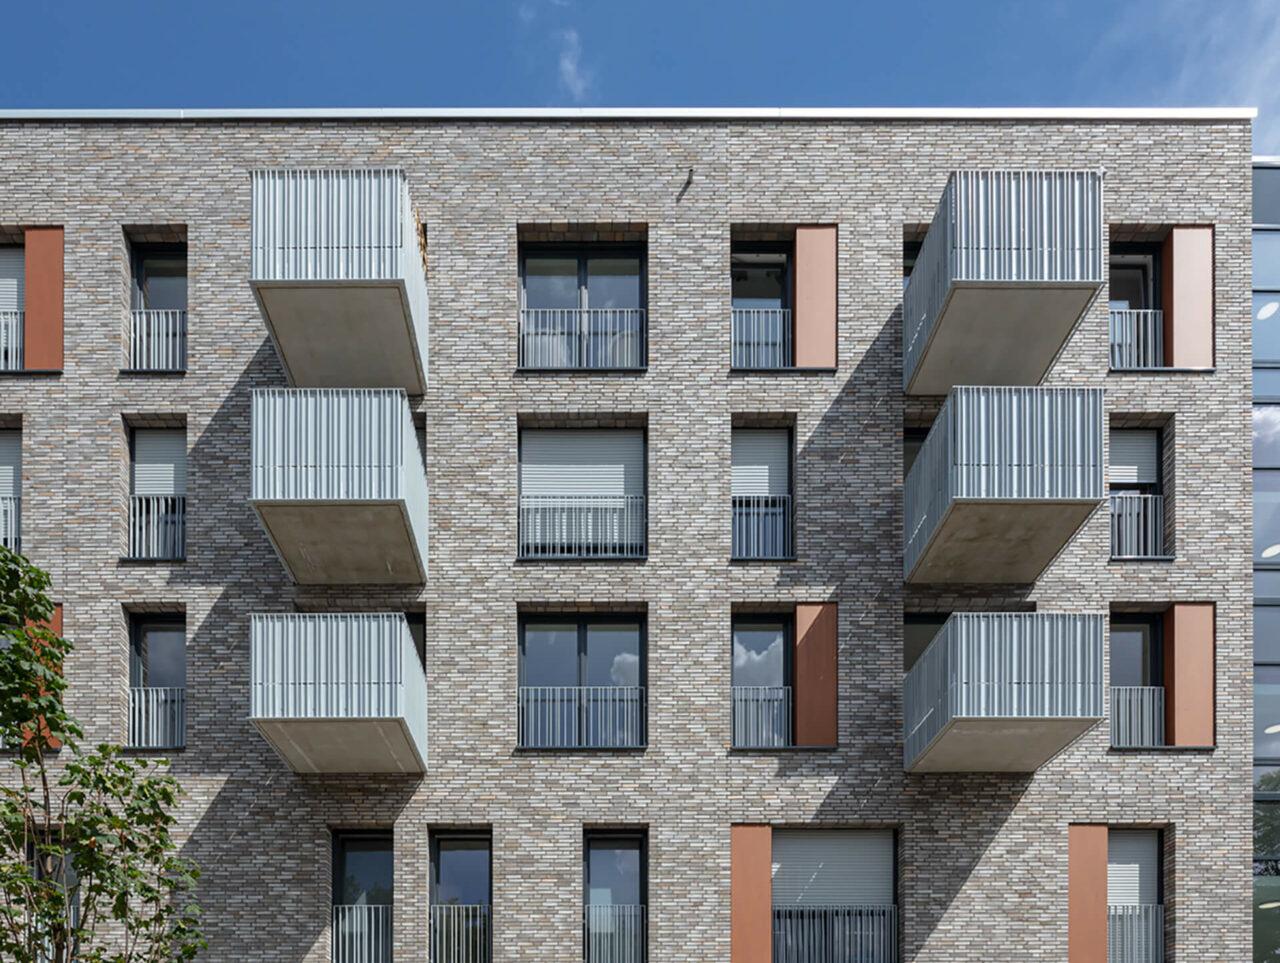 Cranachhoefe Essen Holsterhausen Neubauprojekt Balkon